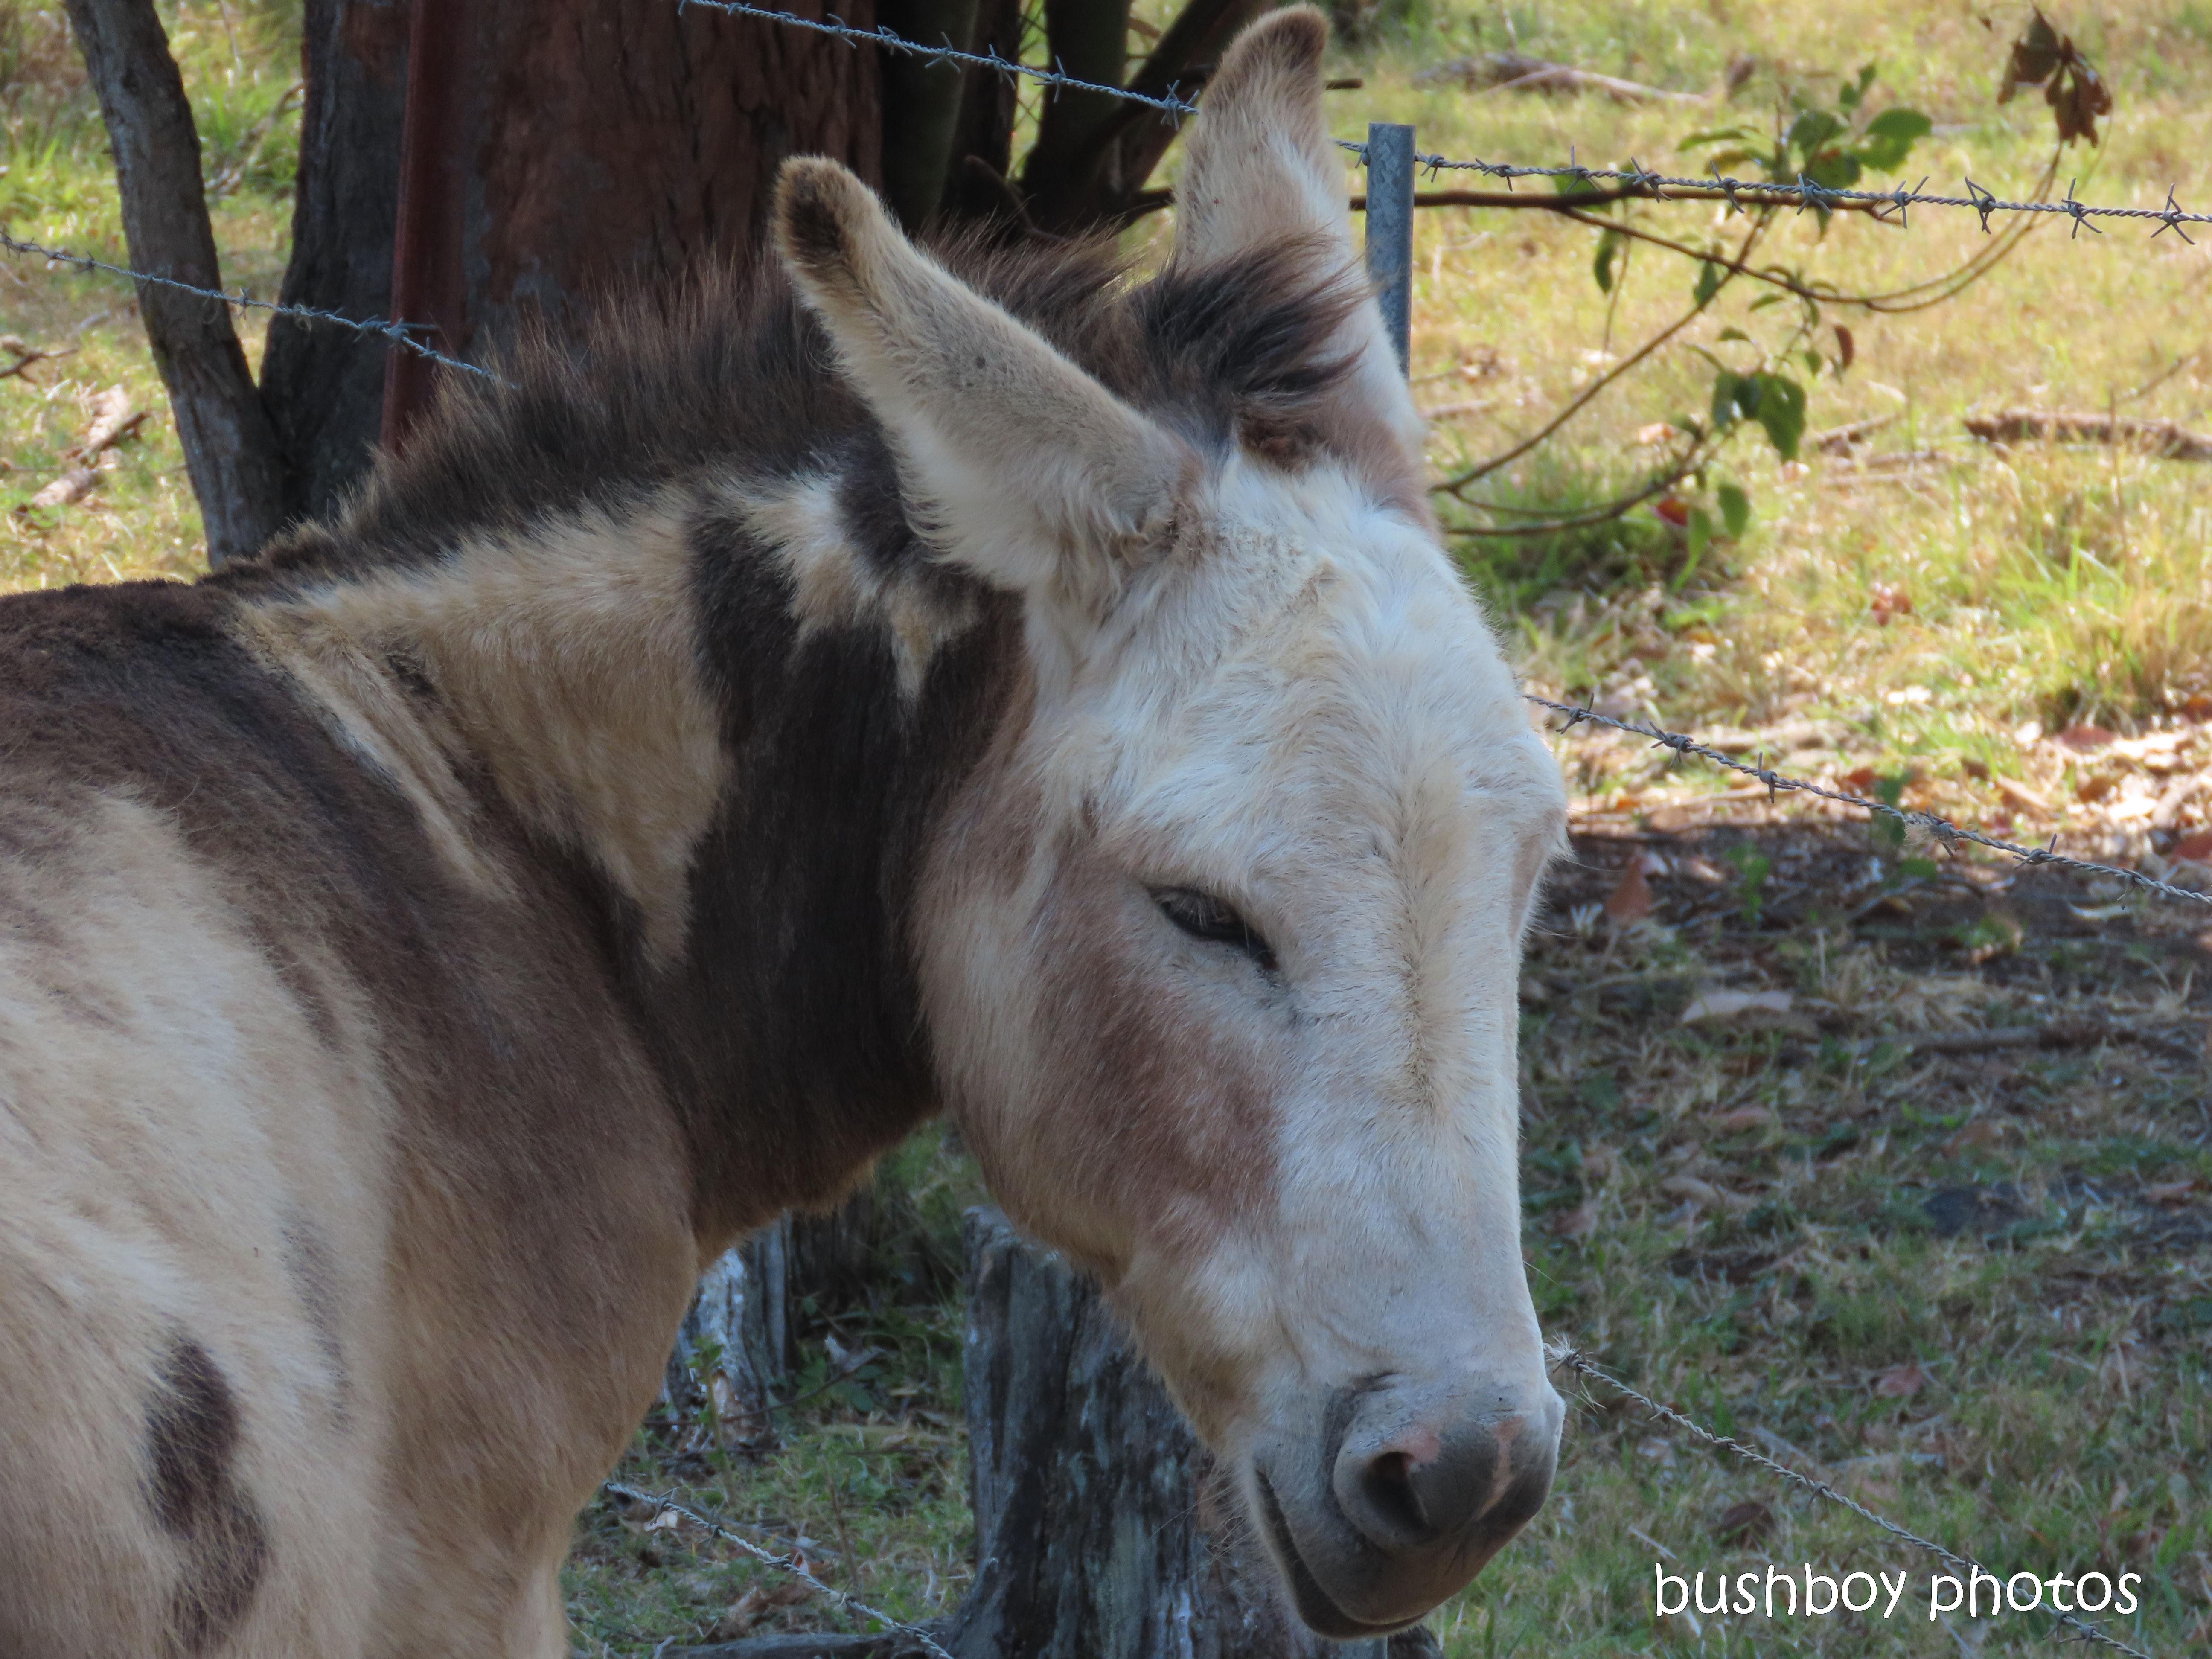 191218_blog_challenge_quote_donkey